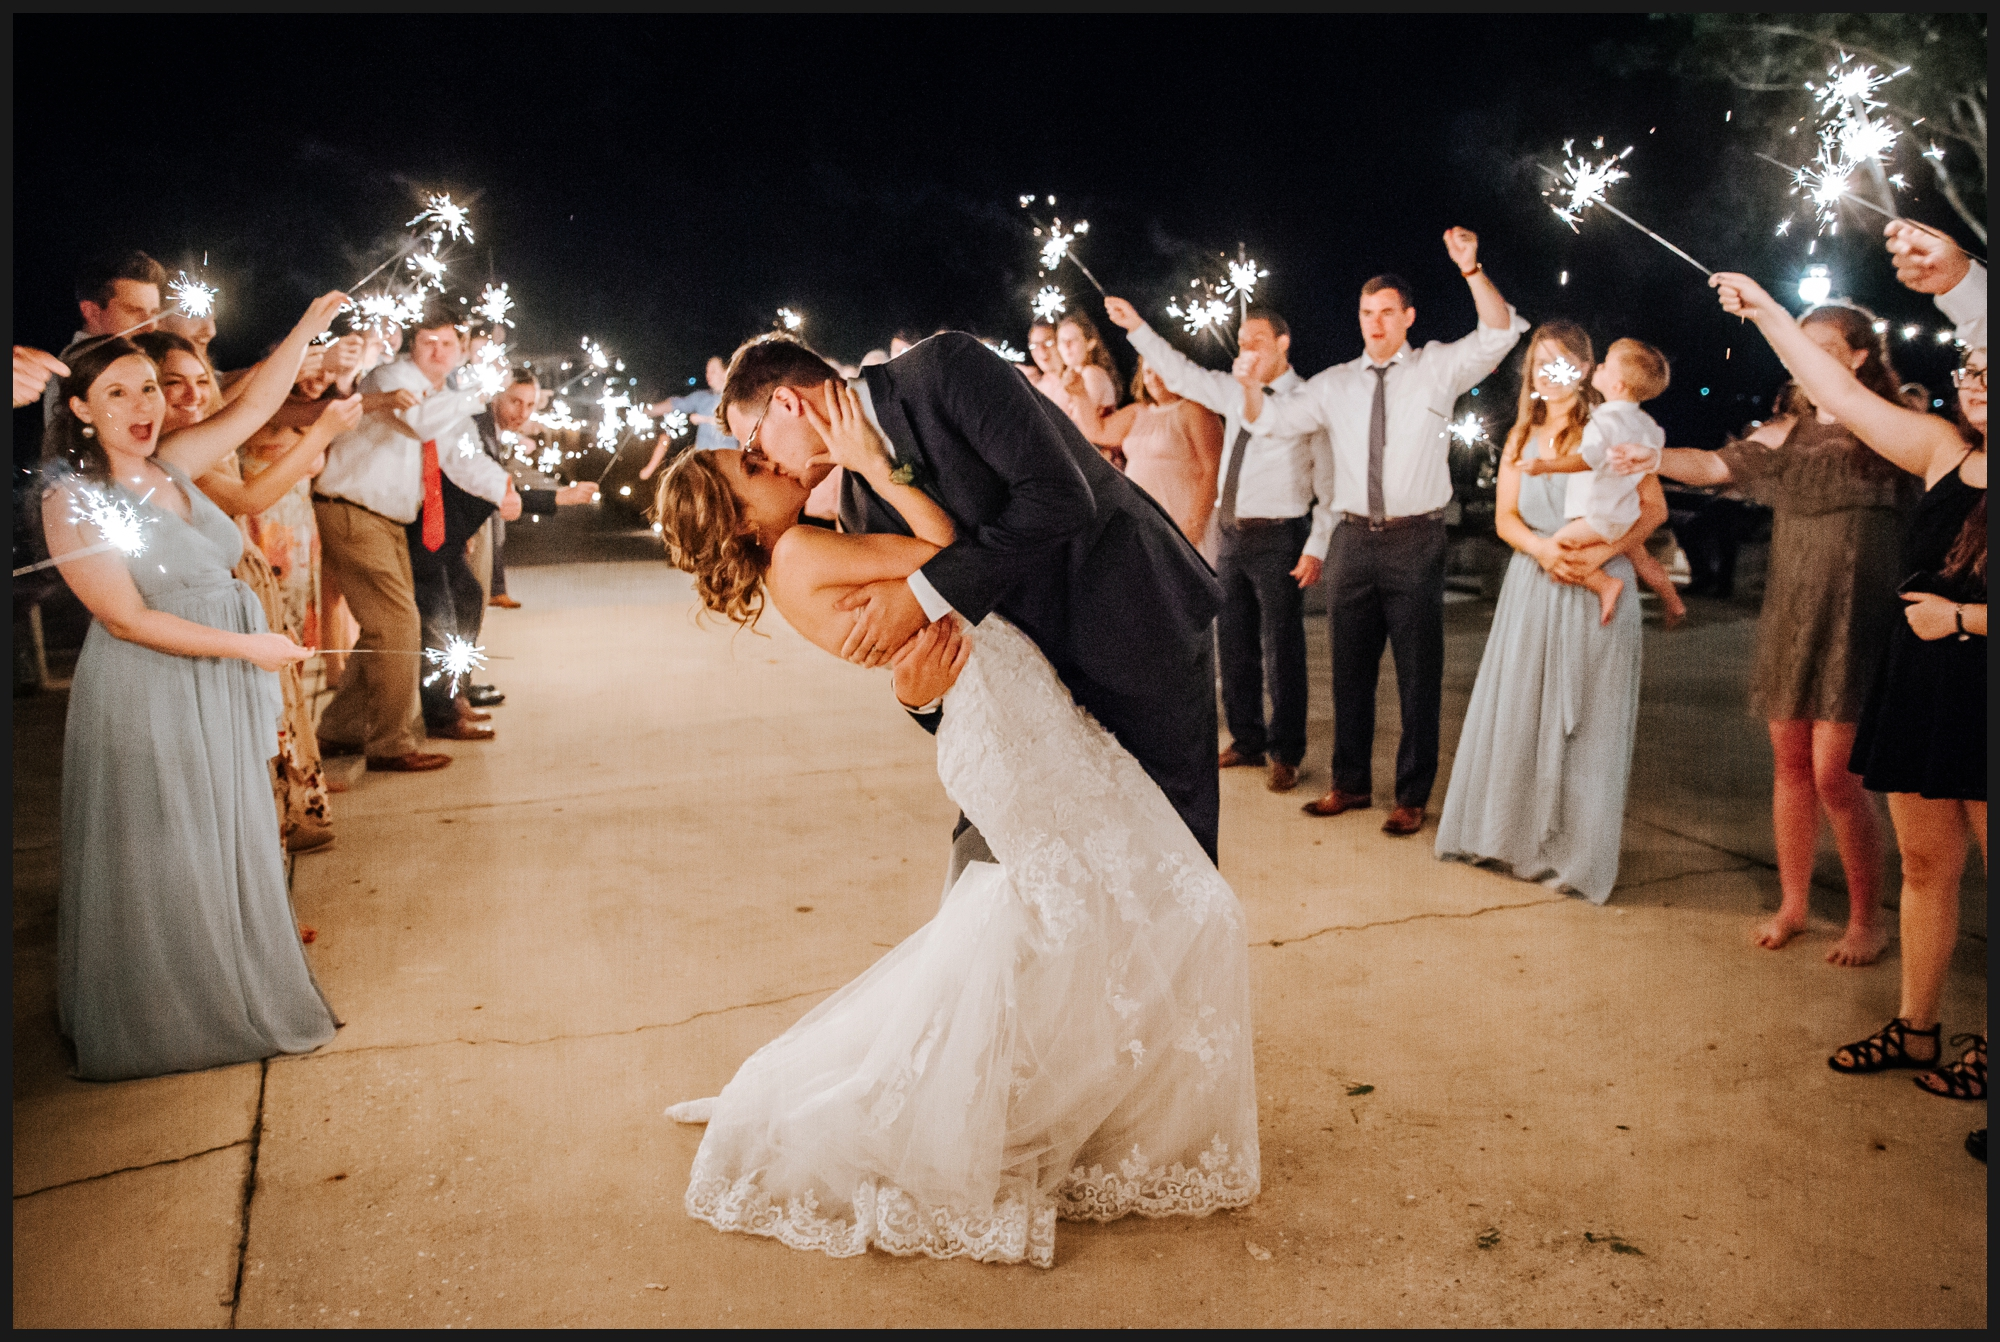 Orlando-Wedding-Photographer-destination-wedding-photographer-florida-wedding-photographer-bohemian-wedding-photographer_0143.jpg